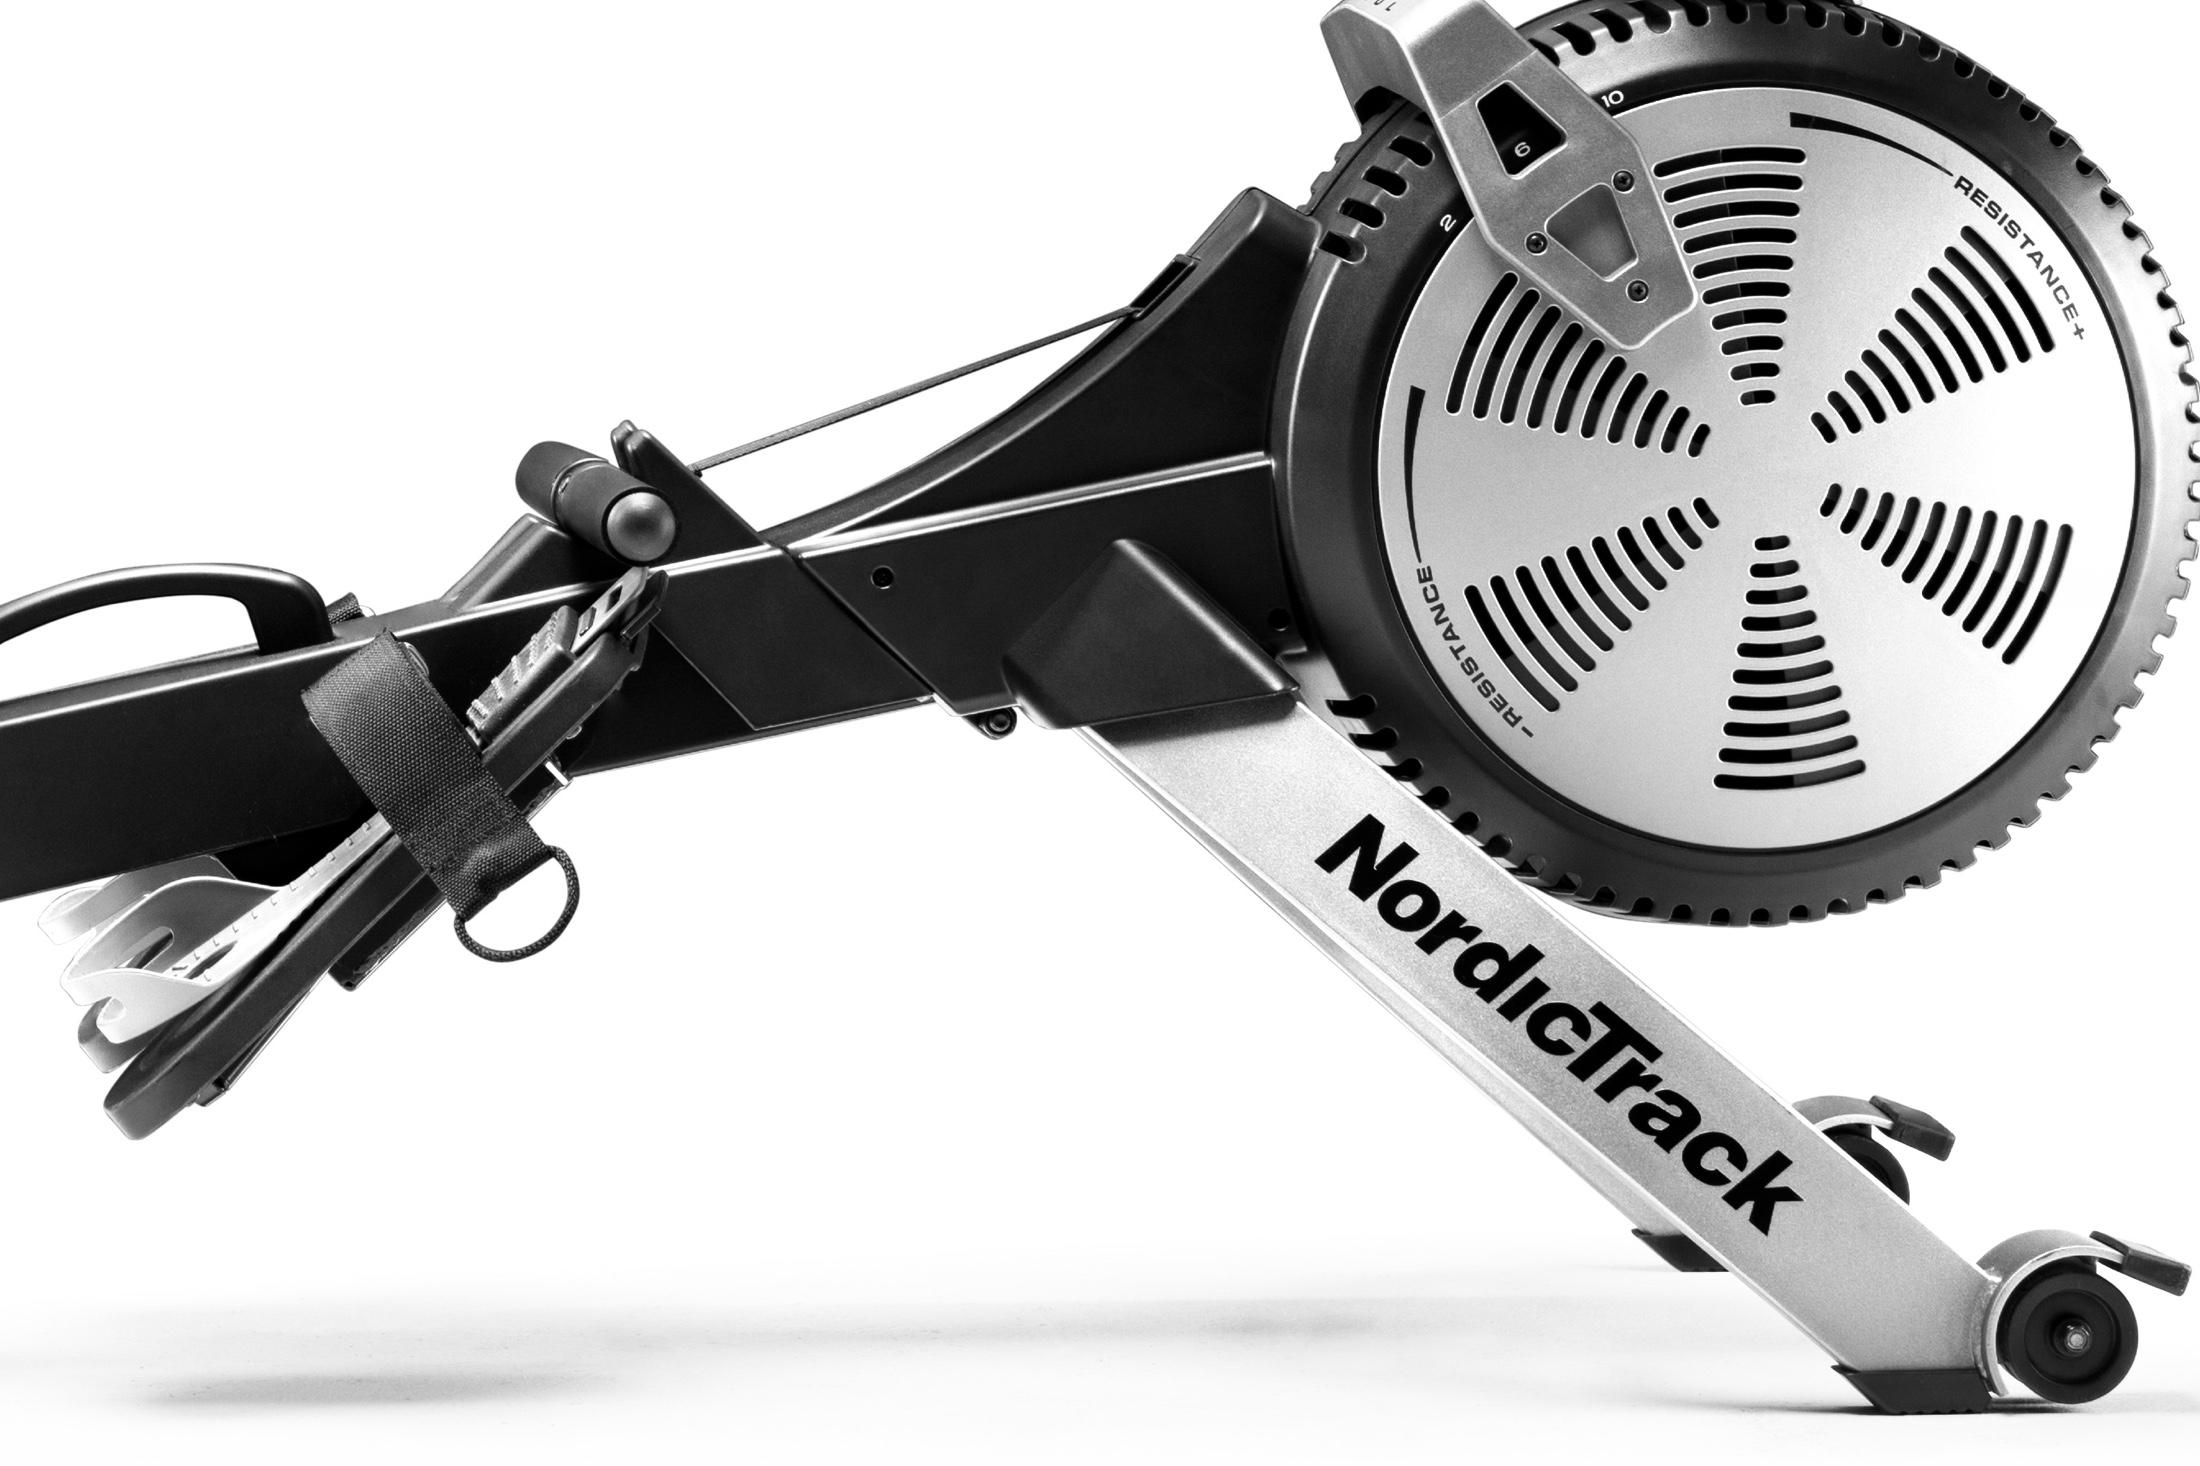 NordicTrack RW900 Rower gallery image 6